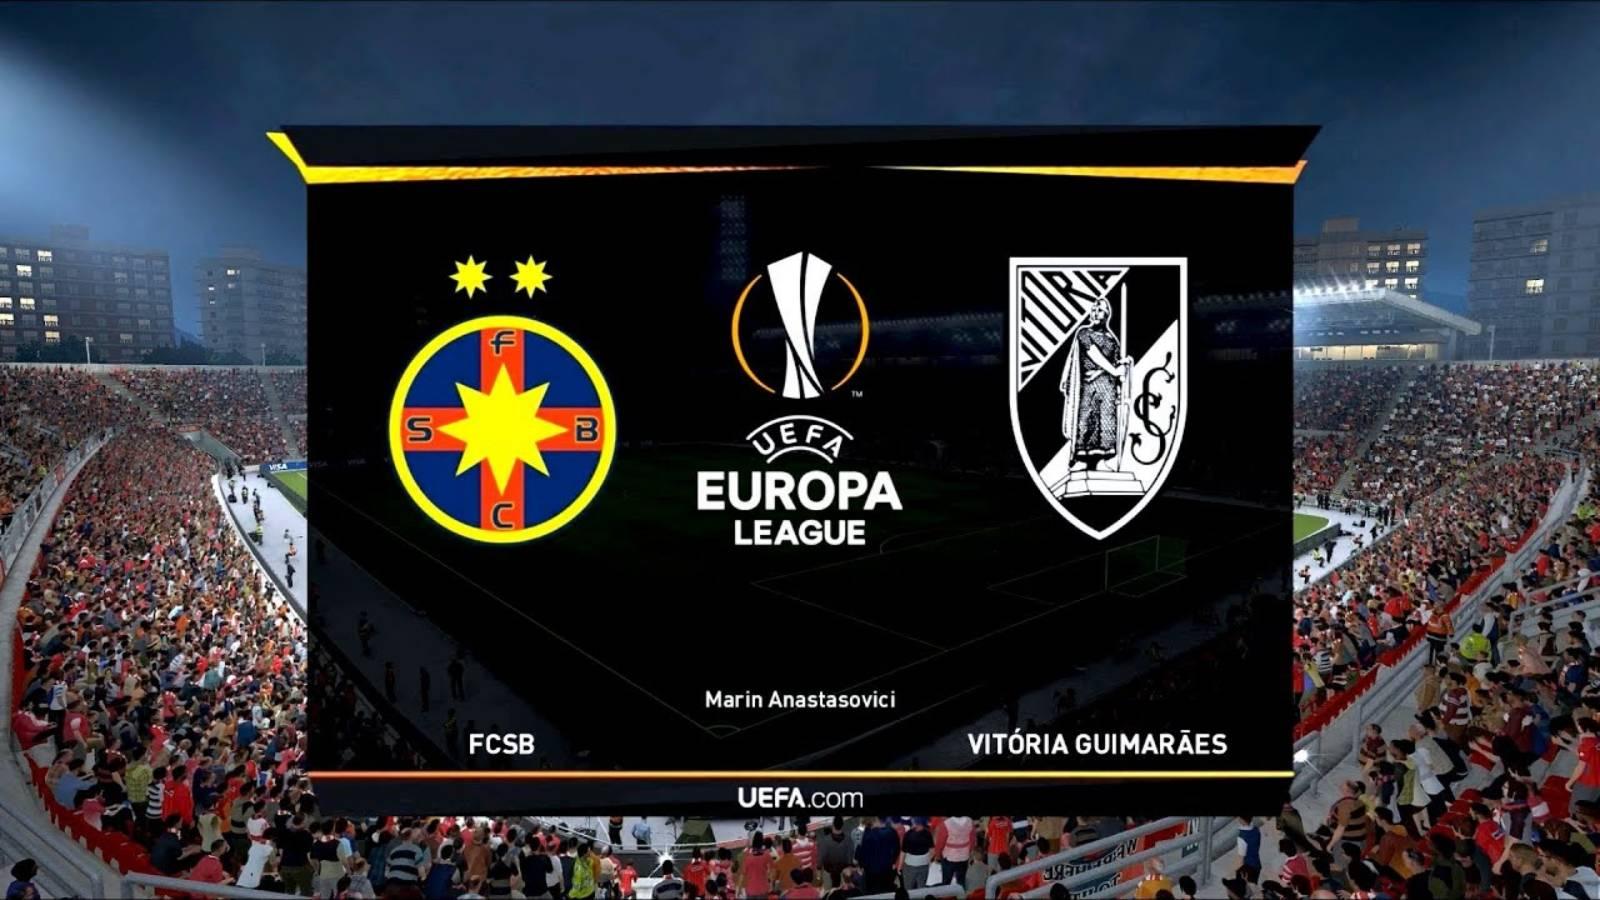 FCSB - VITORIA GUIMARAES LIVE PRO TV FOTBAL EUROPA LEAGUE